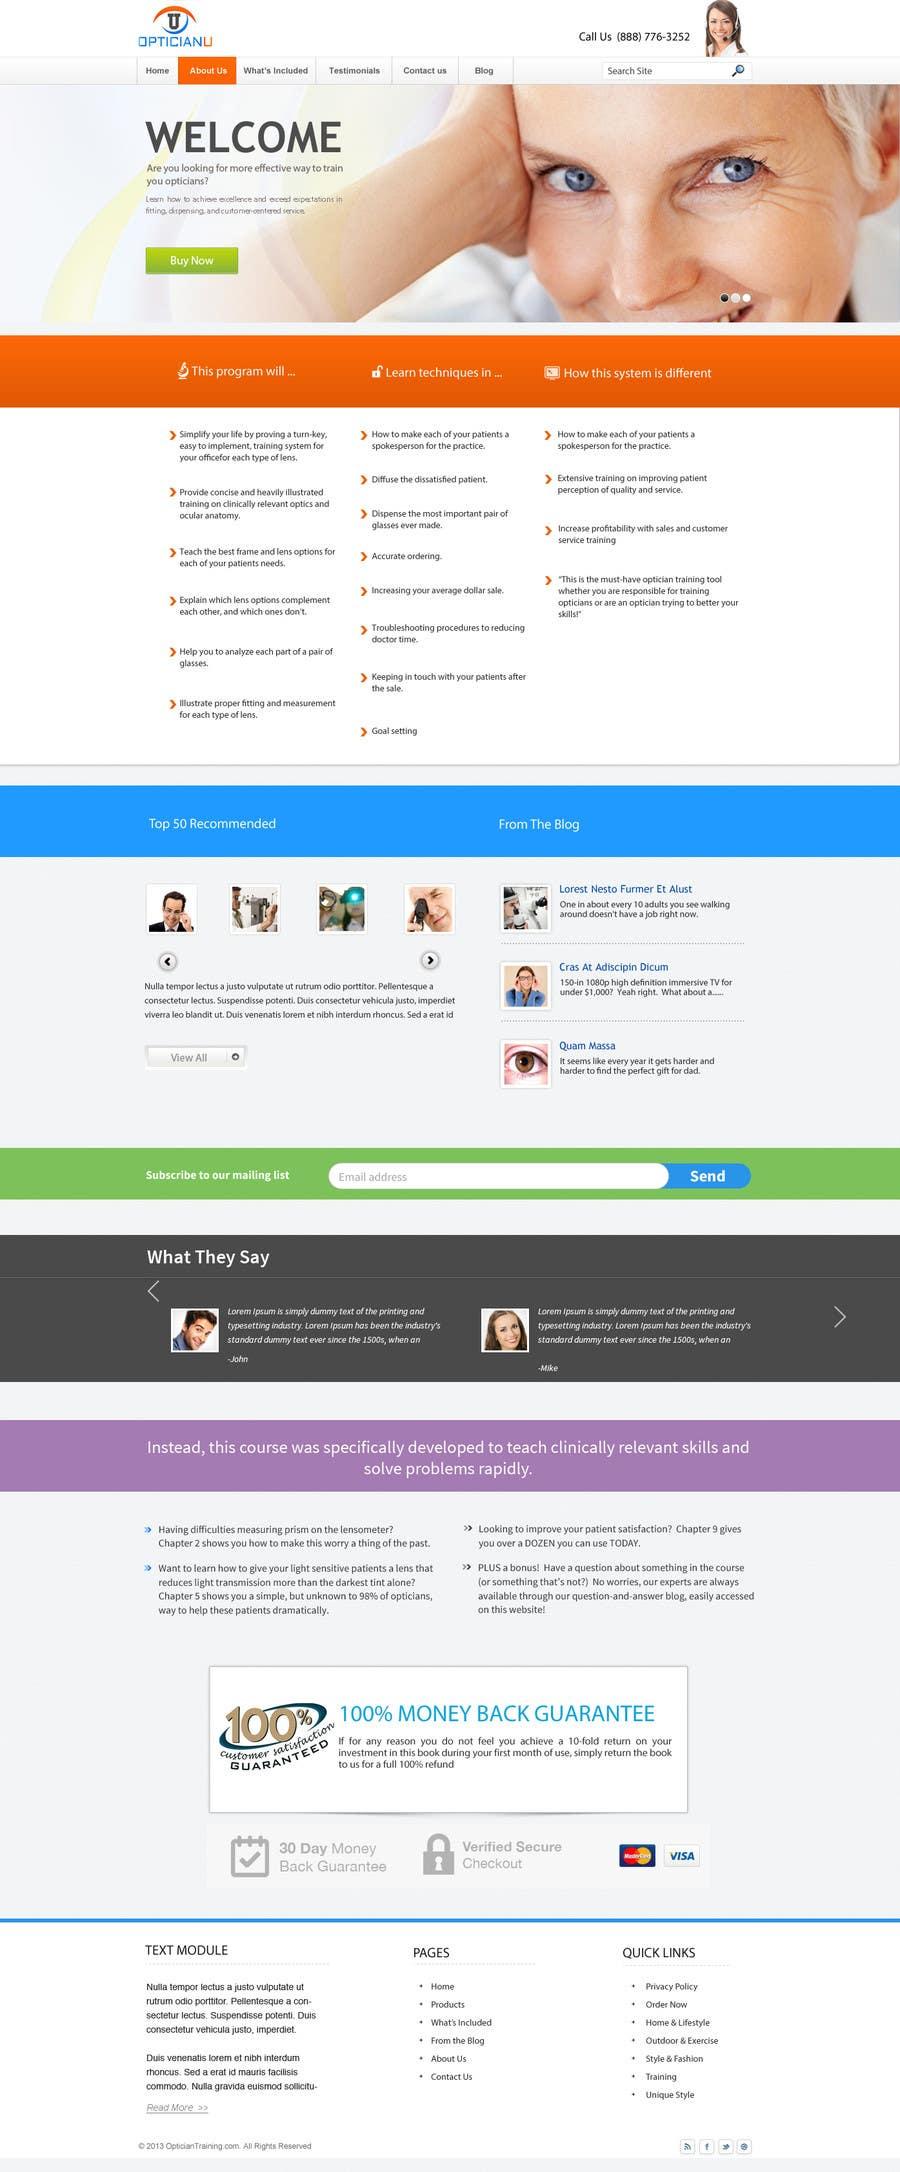 Penyertaan Peraduan #                                        8                                      untuk                                         Design a Website Mockup for www.OpticianTraining.com